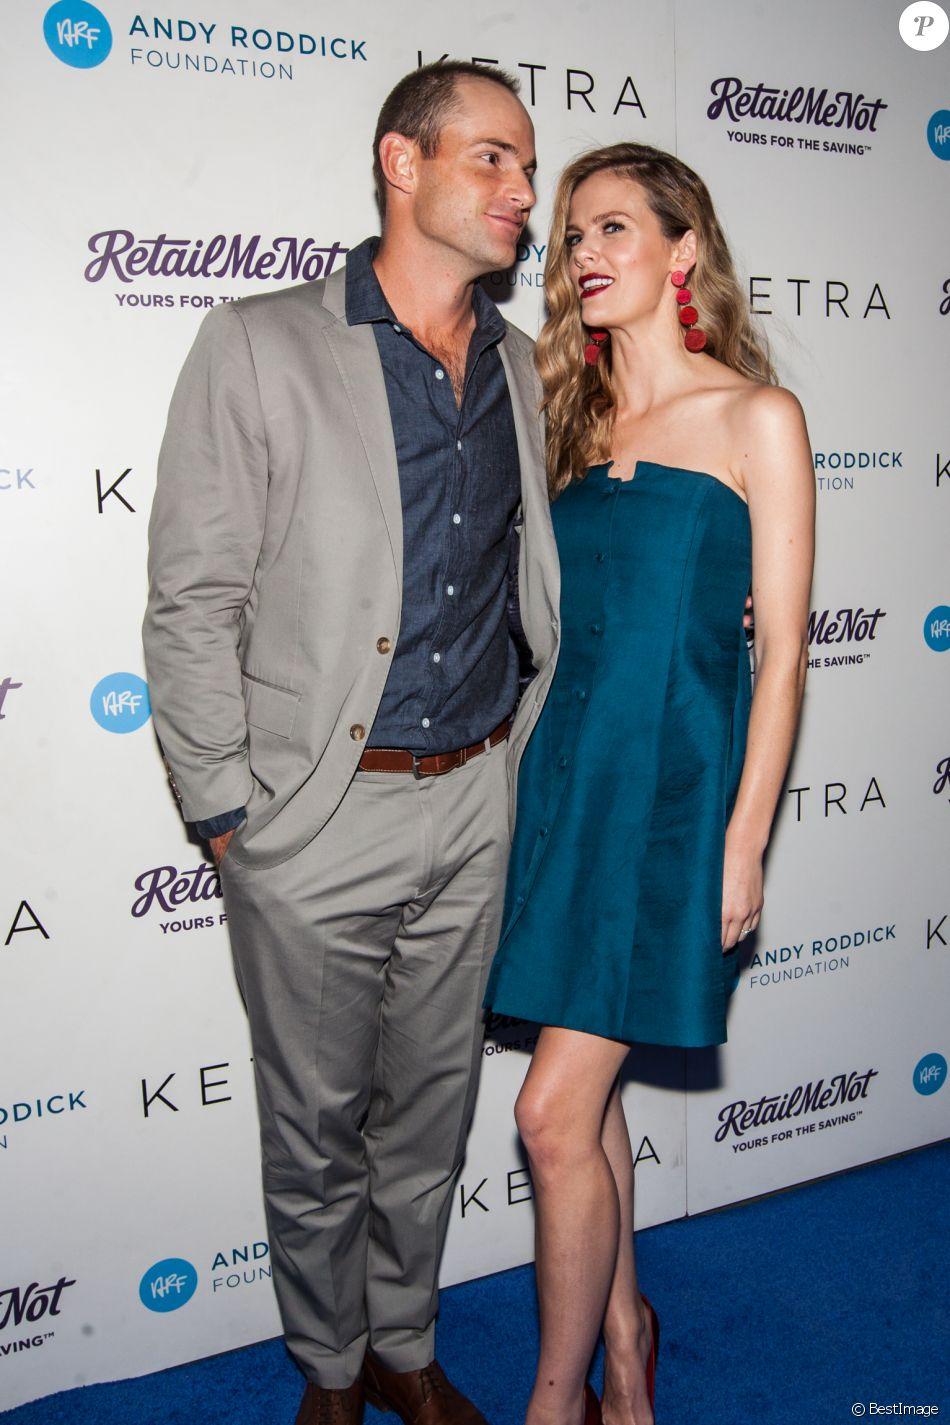 Andy Roddick avec sa femme Brooklyn Decker à la 11ème soirée caritative Andy Roddick à Austin au Texas, le 18 novembre 2016 © Michael Mullenix via Zuma/Bestimage